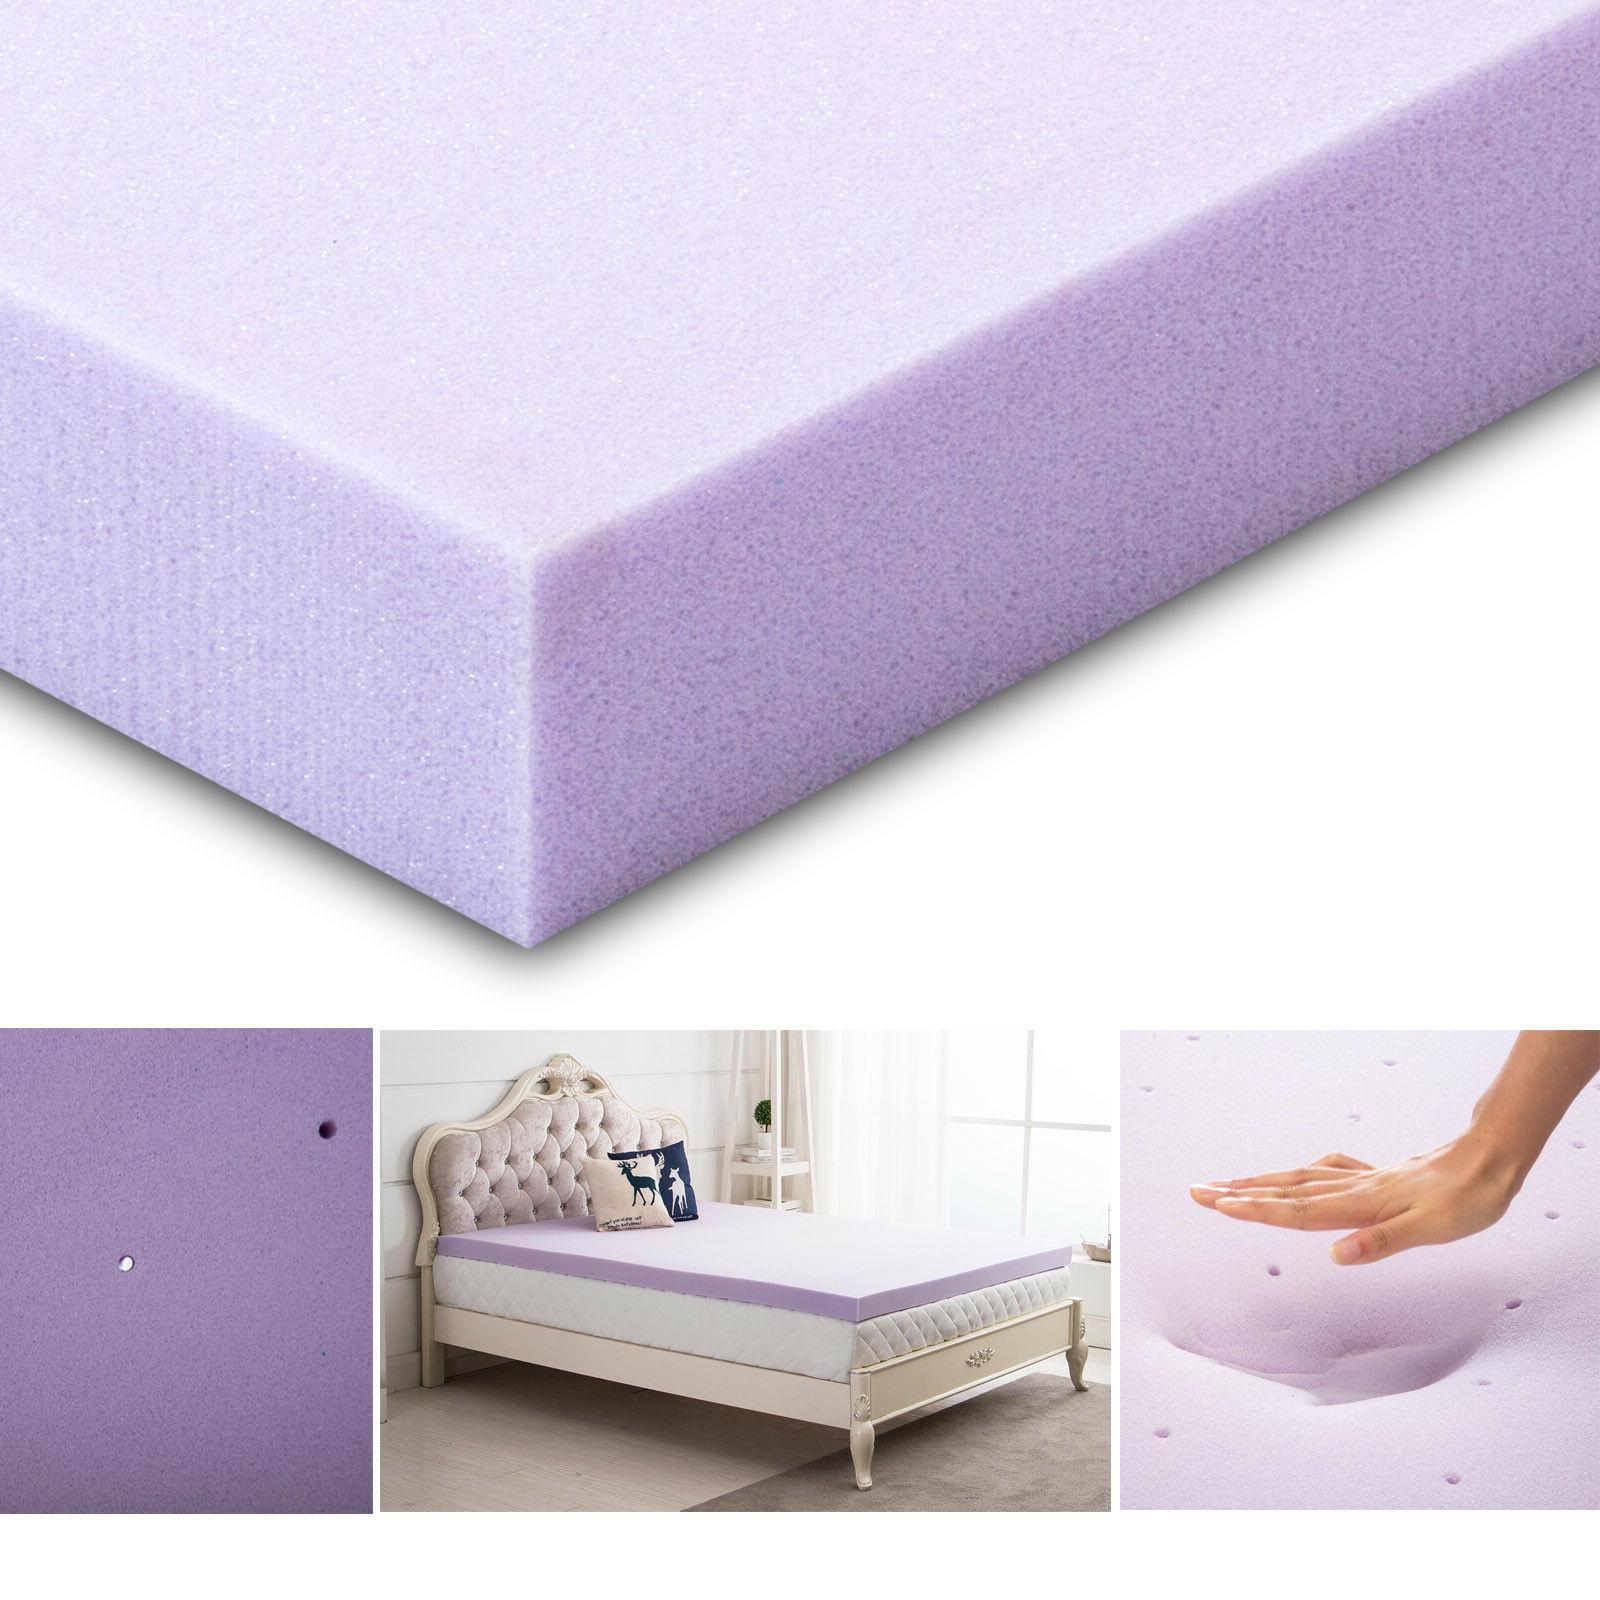 3 Inch Foam Mattress Topper Dot Bed King